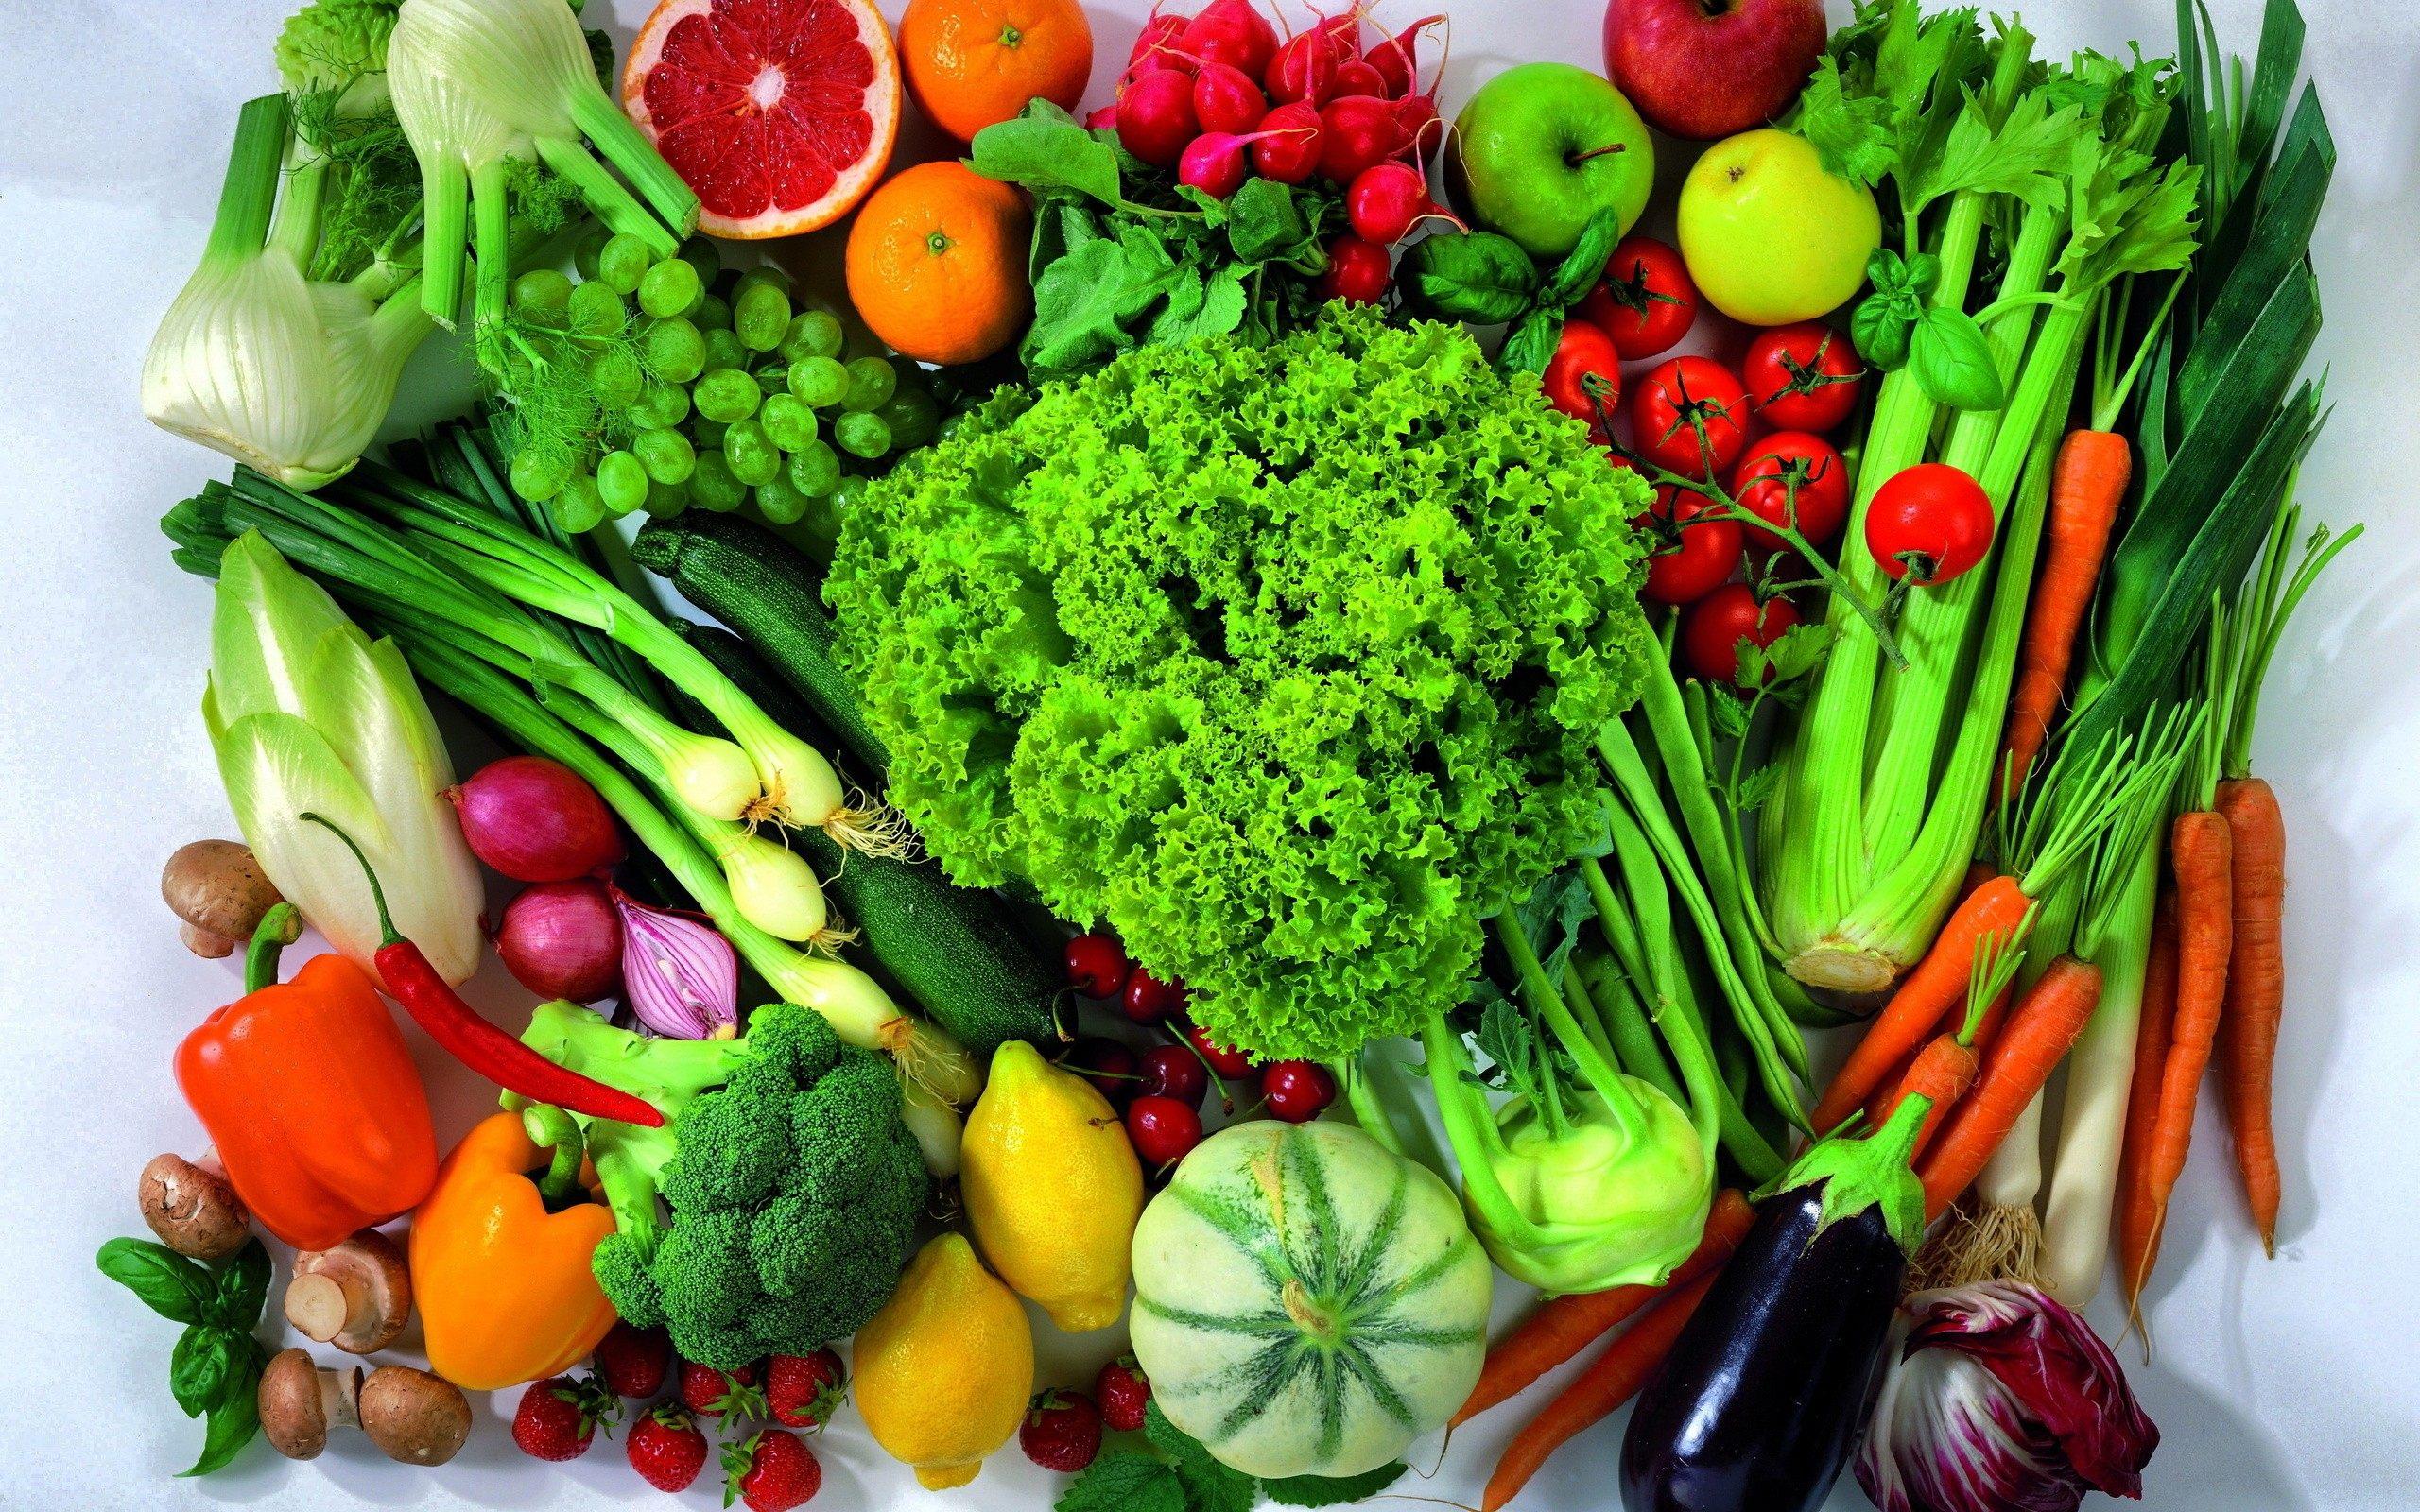 La Tendance Healthy Food